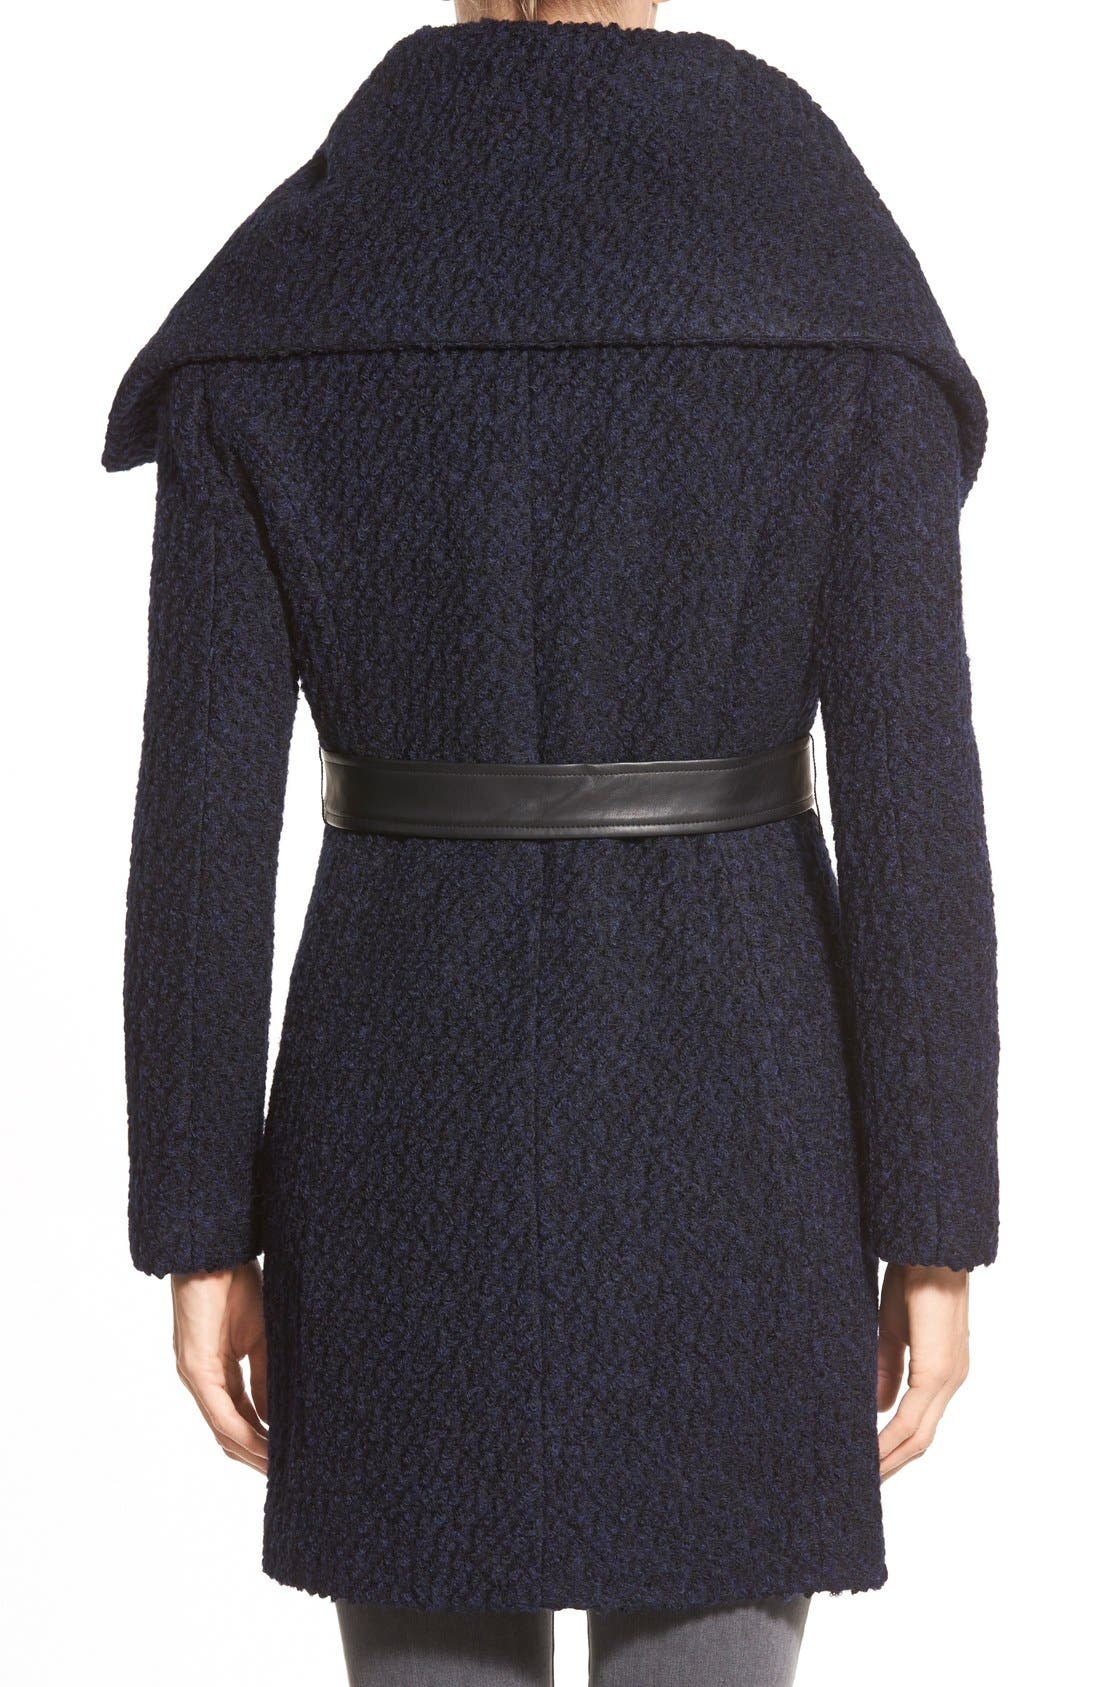 Belted Asymmetrical Bouclé Wool Blend Coat,                             Alternate thumbnail 2, color,                             004